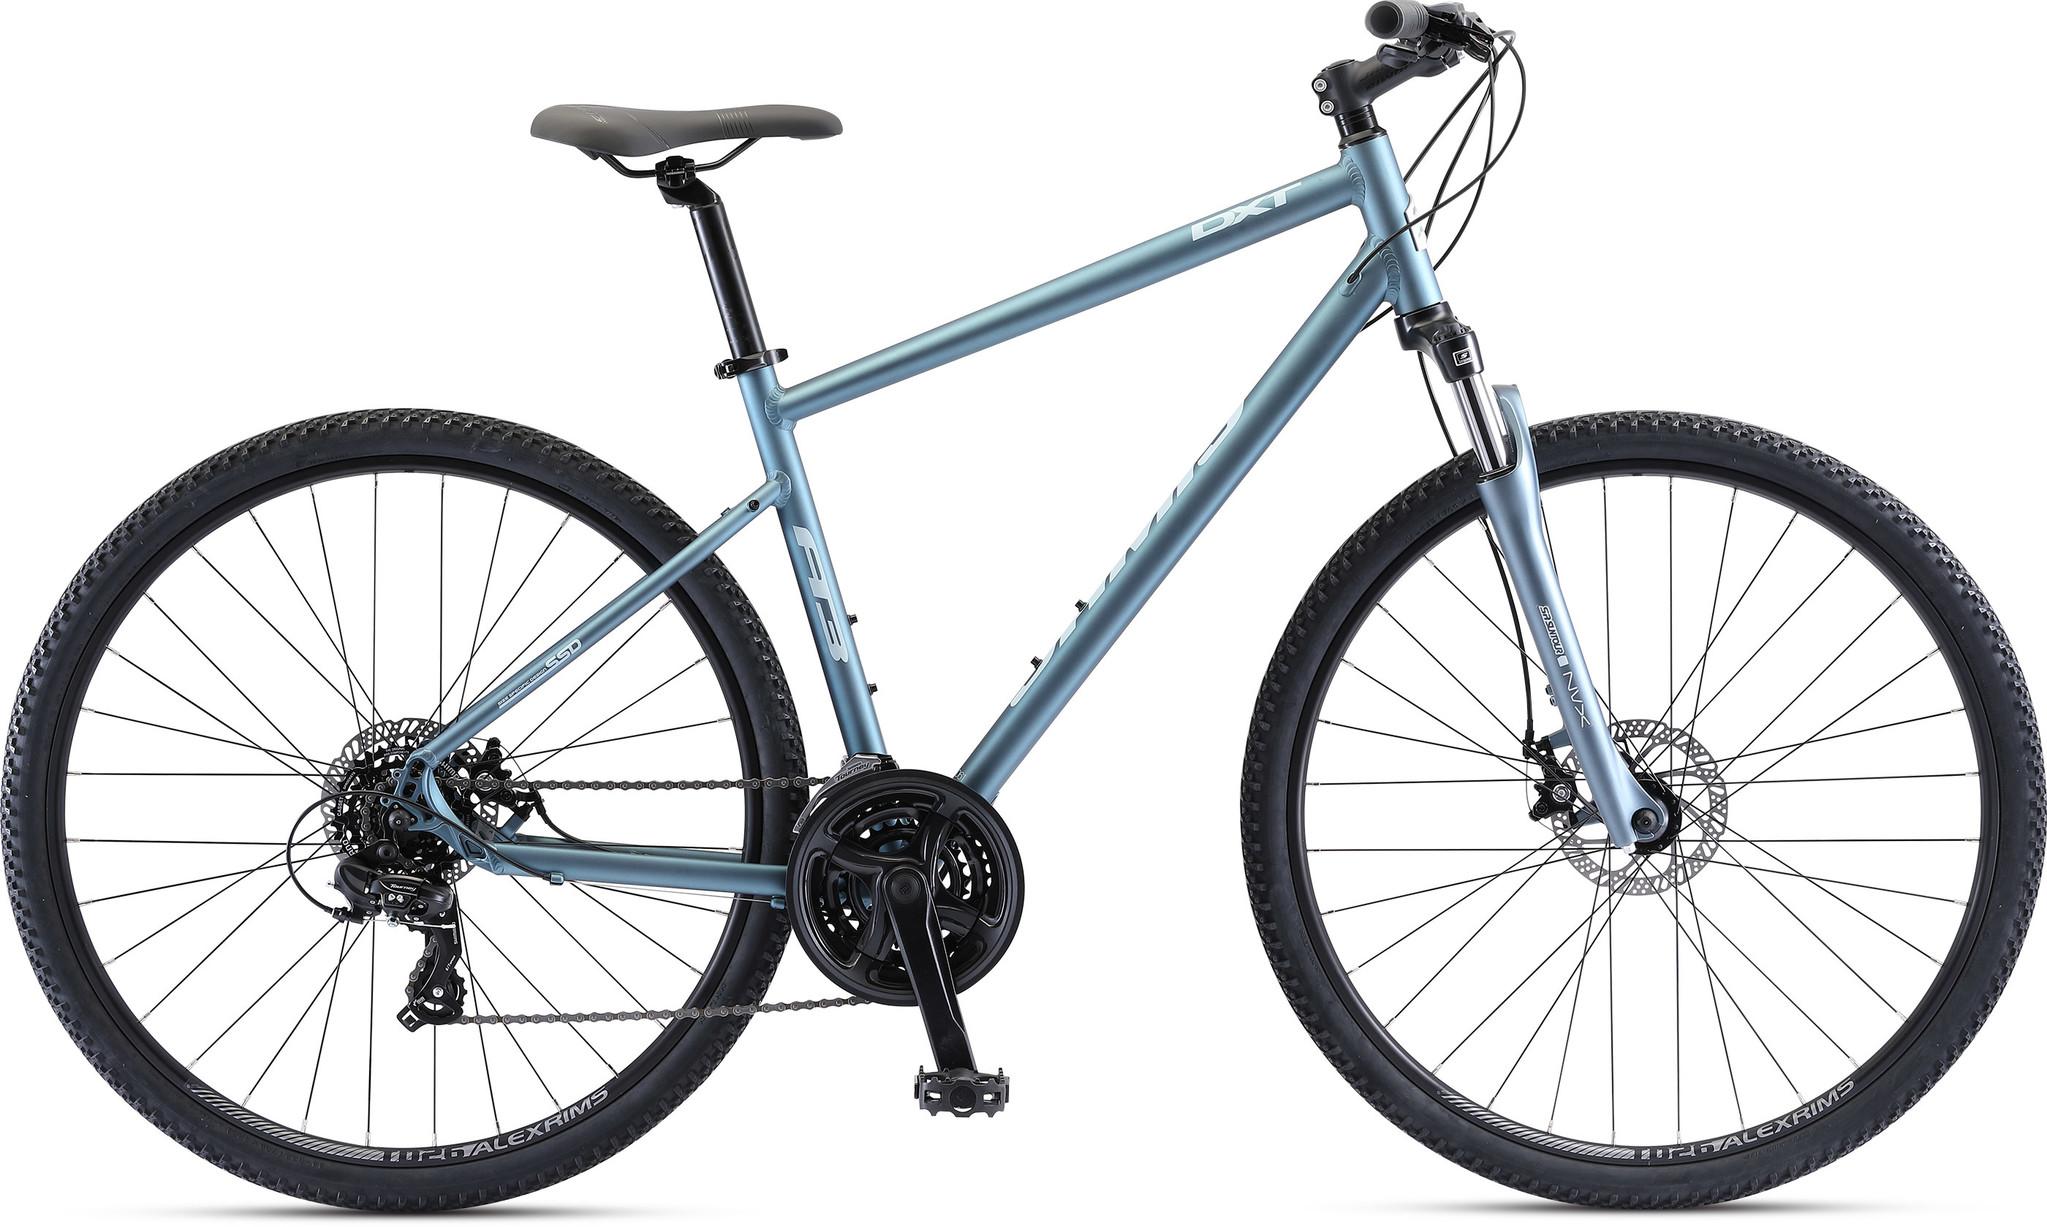 2021 Jamis bikes have arrived!